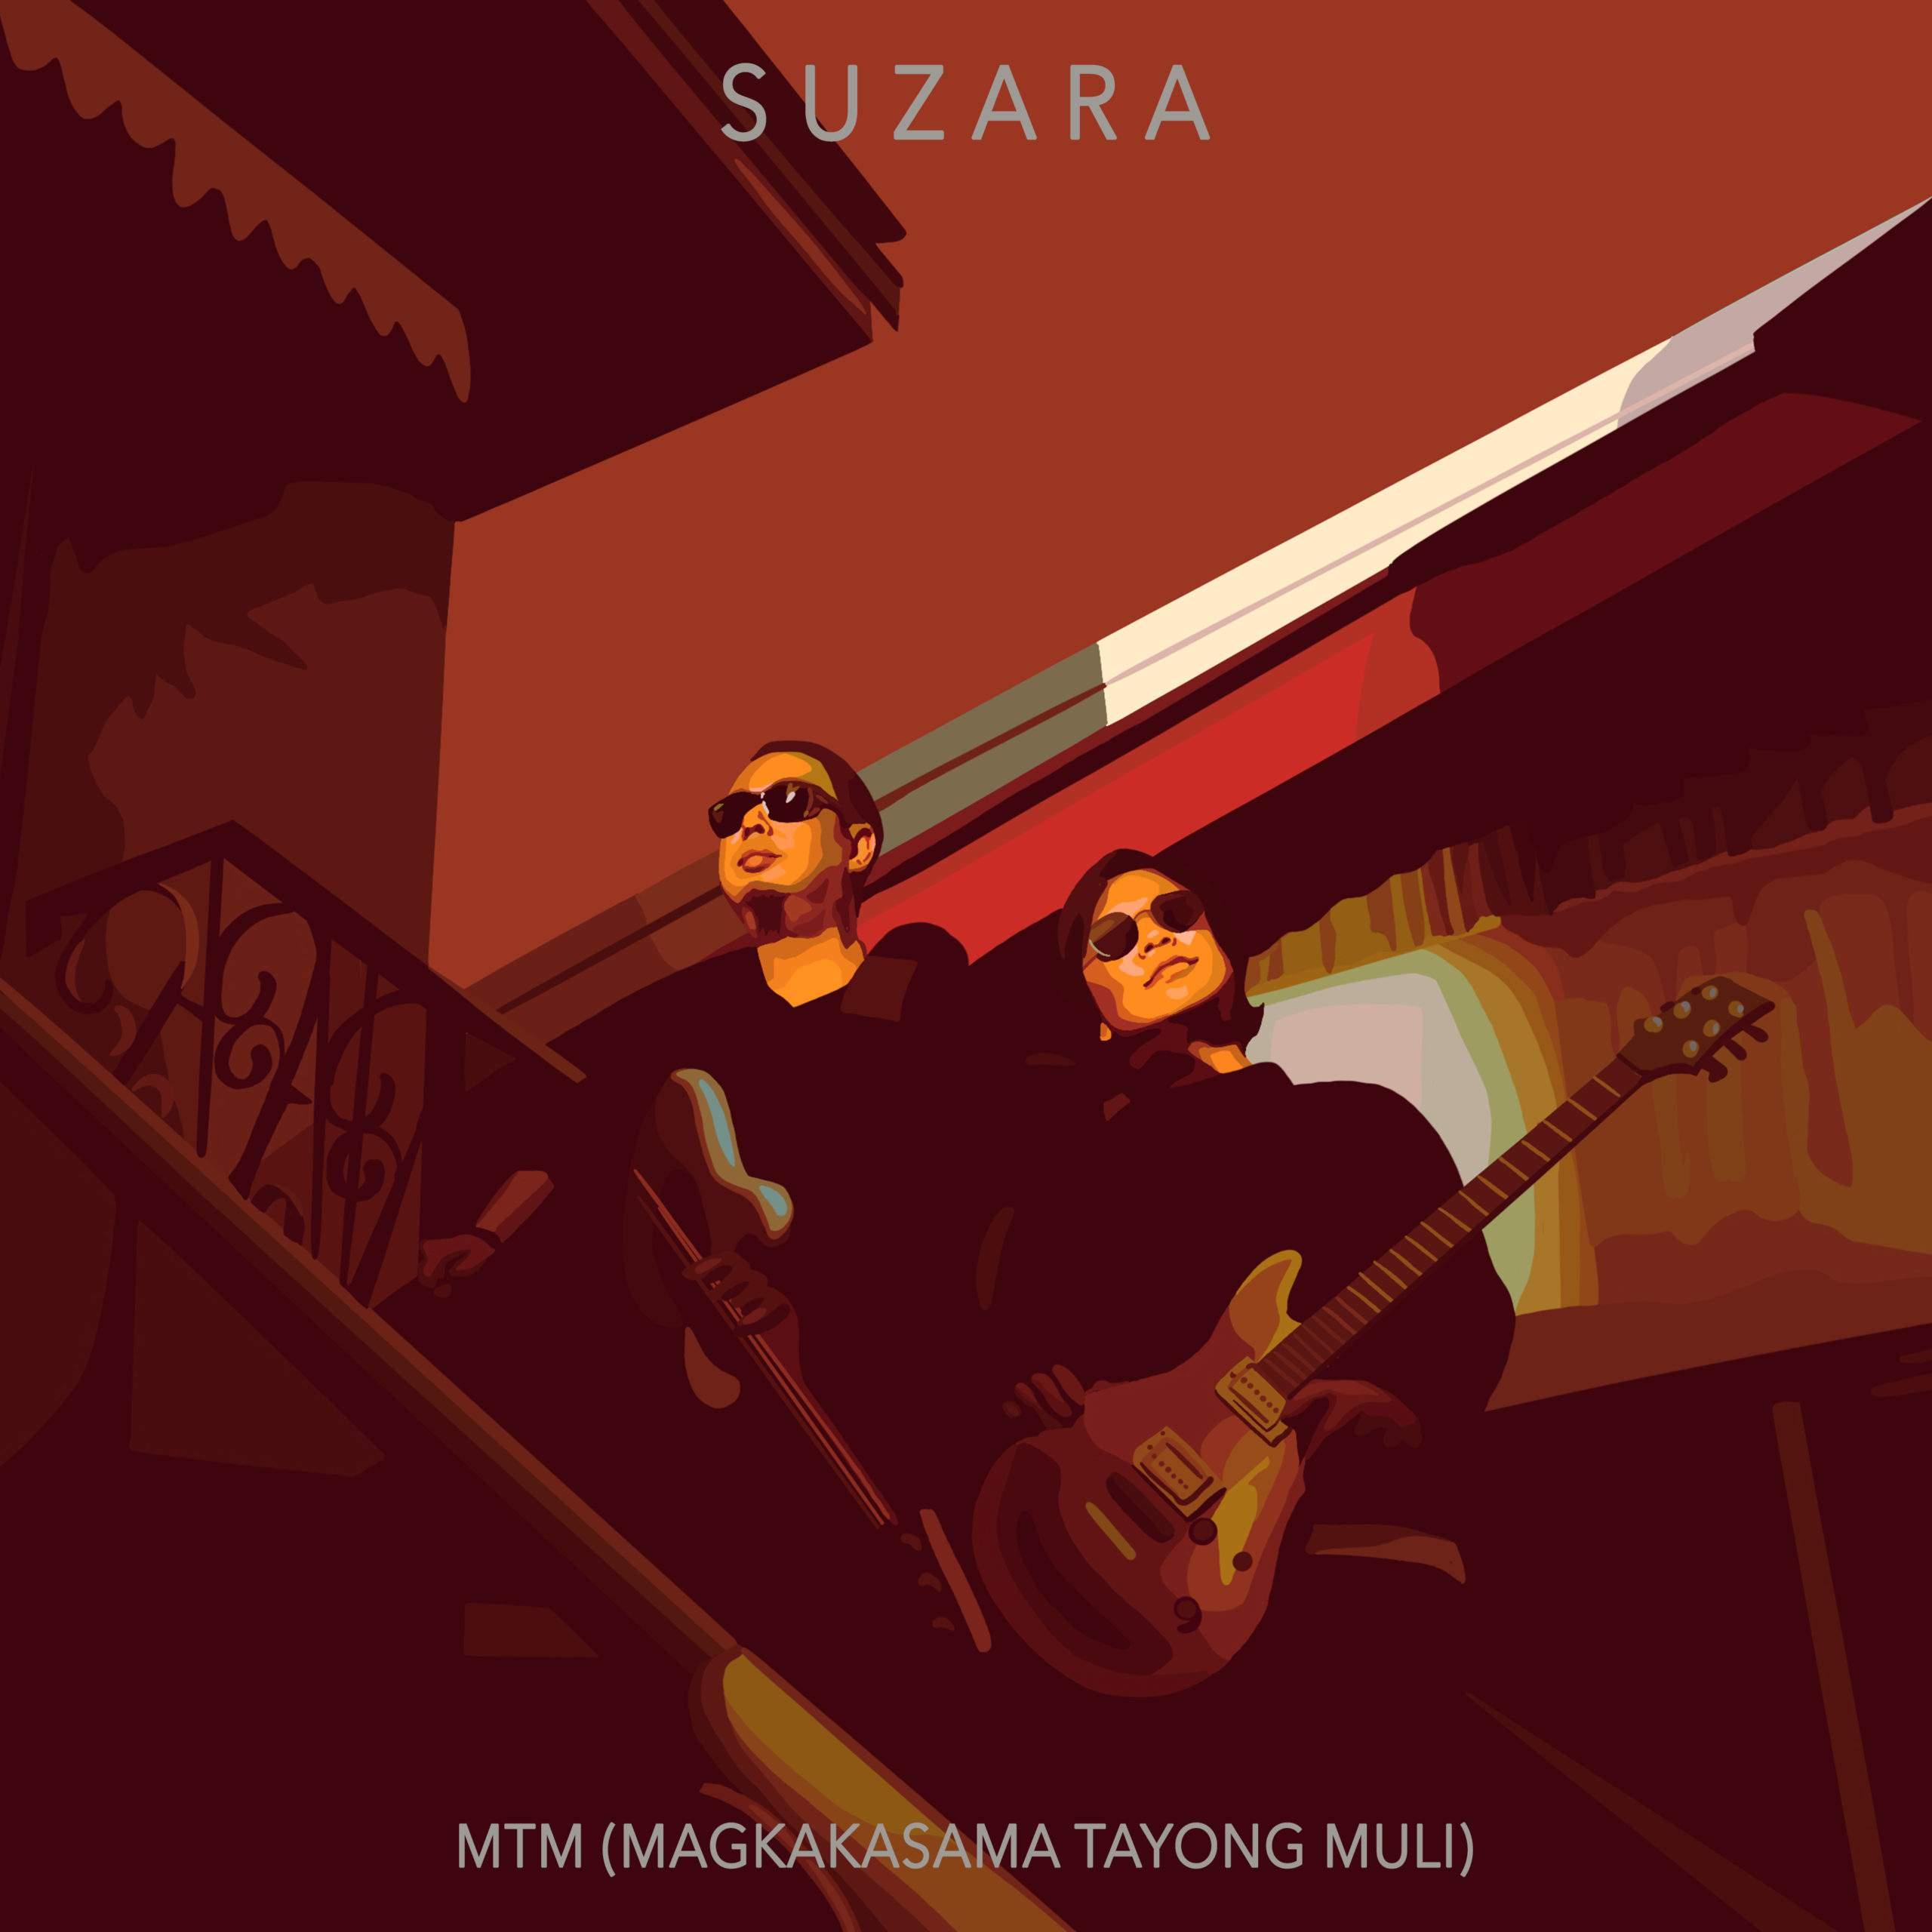 Suzara